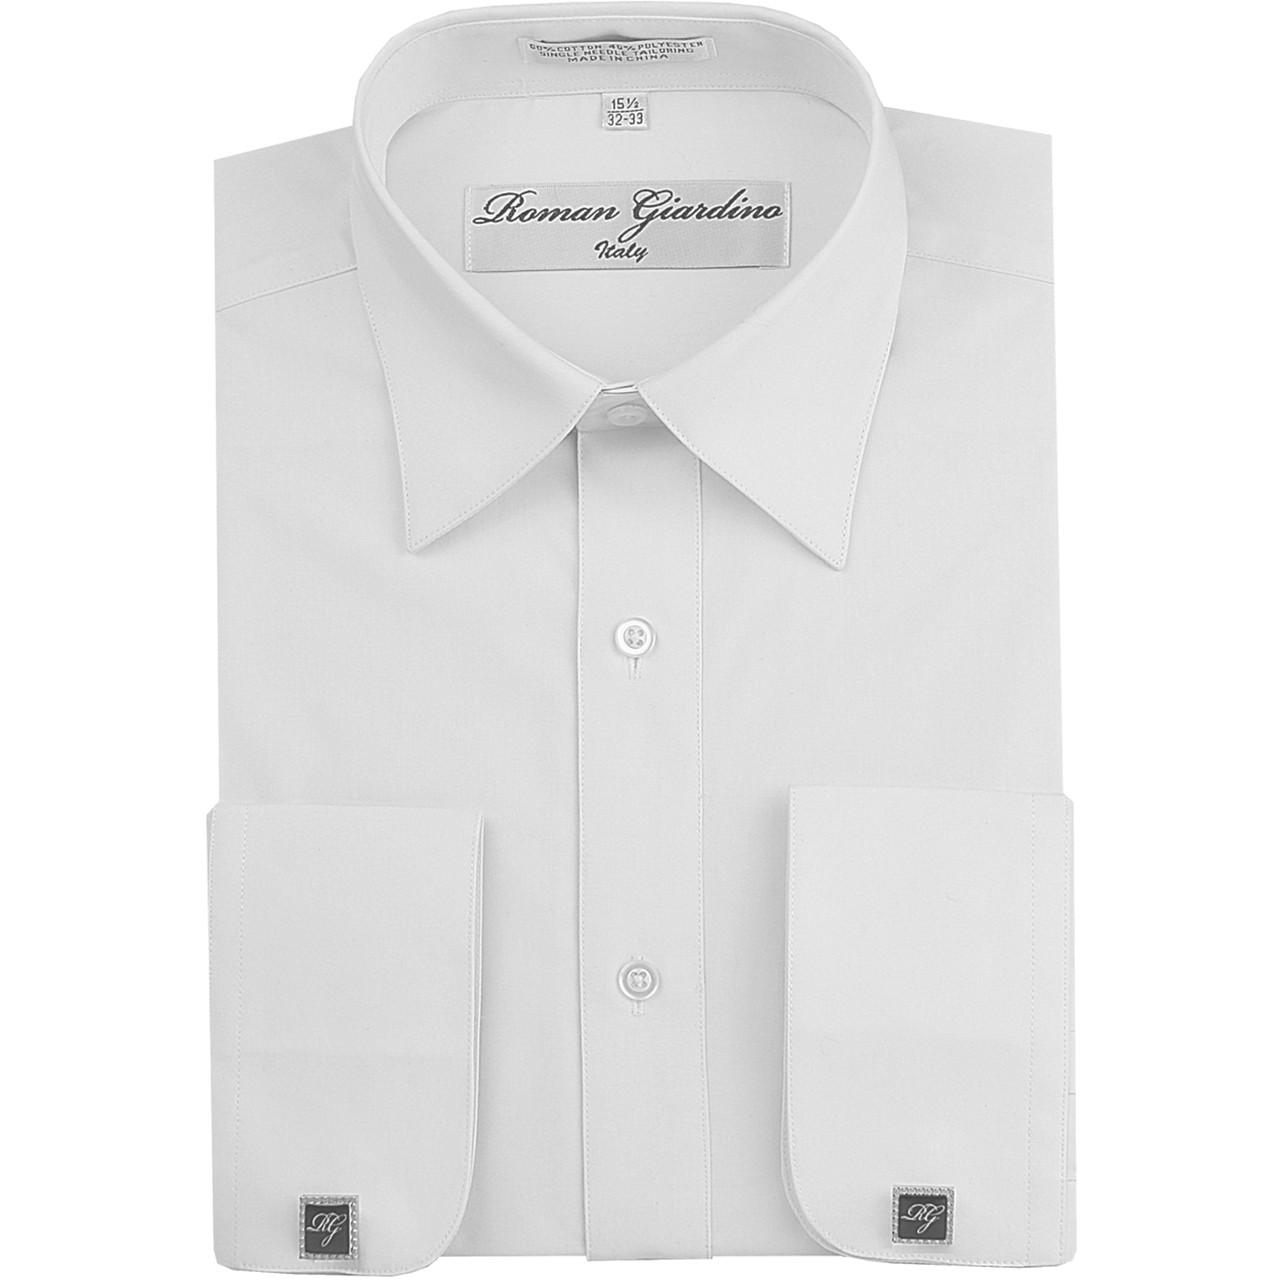 Roman Giardino Mens Cotton Dress Shirt Only 26 Bleach White